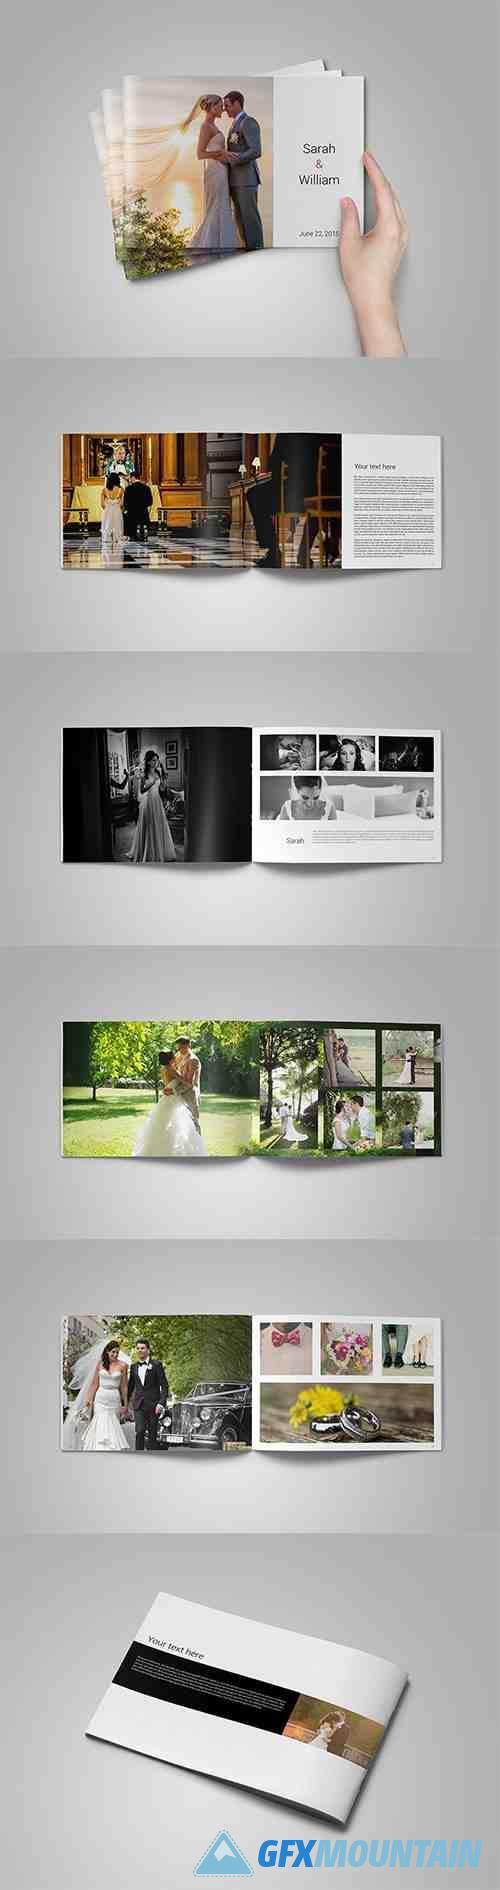 Indesign Wedding Album Templates Free Download